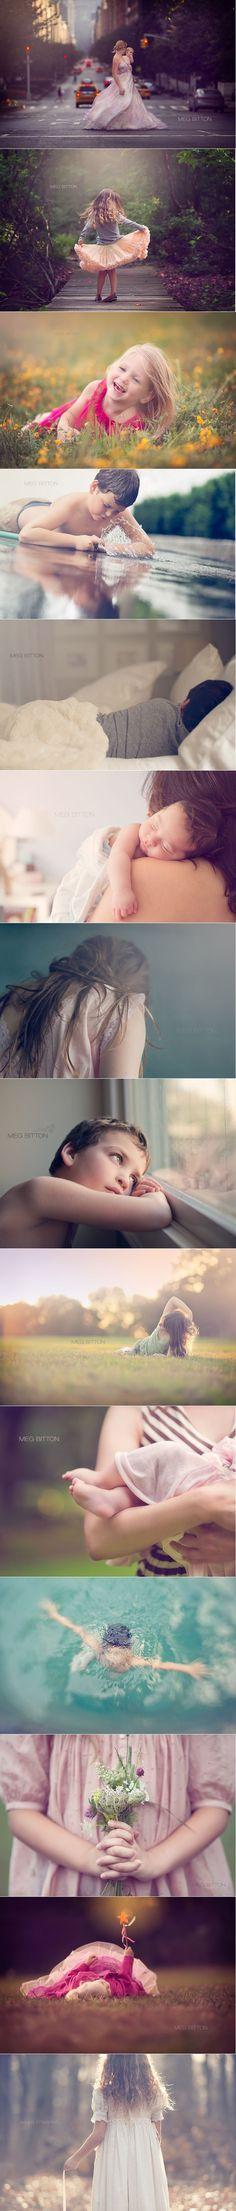 magical photo inspiration